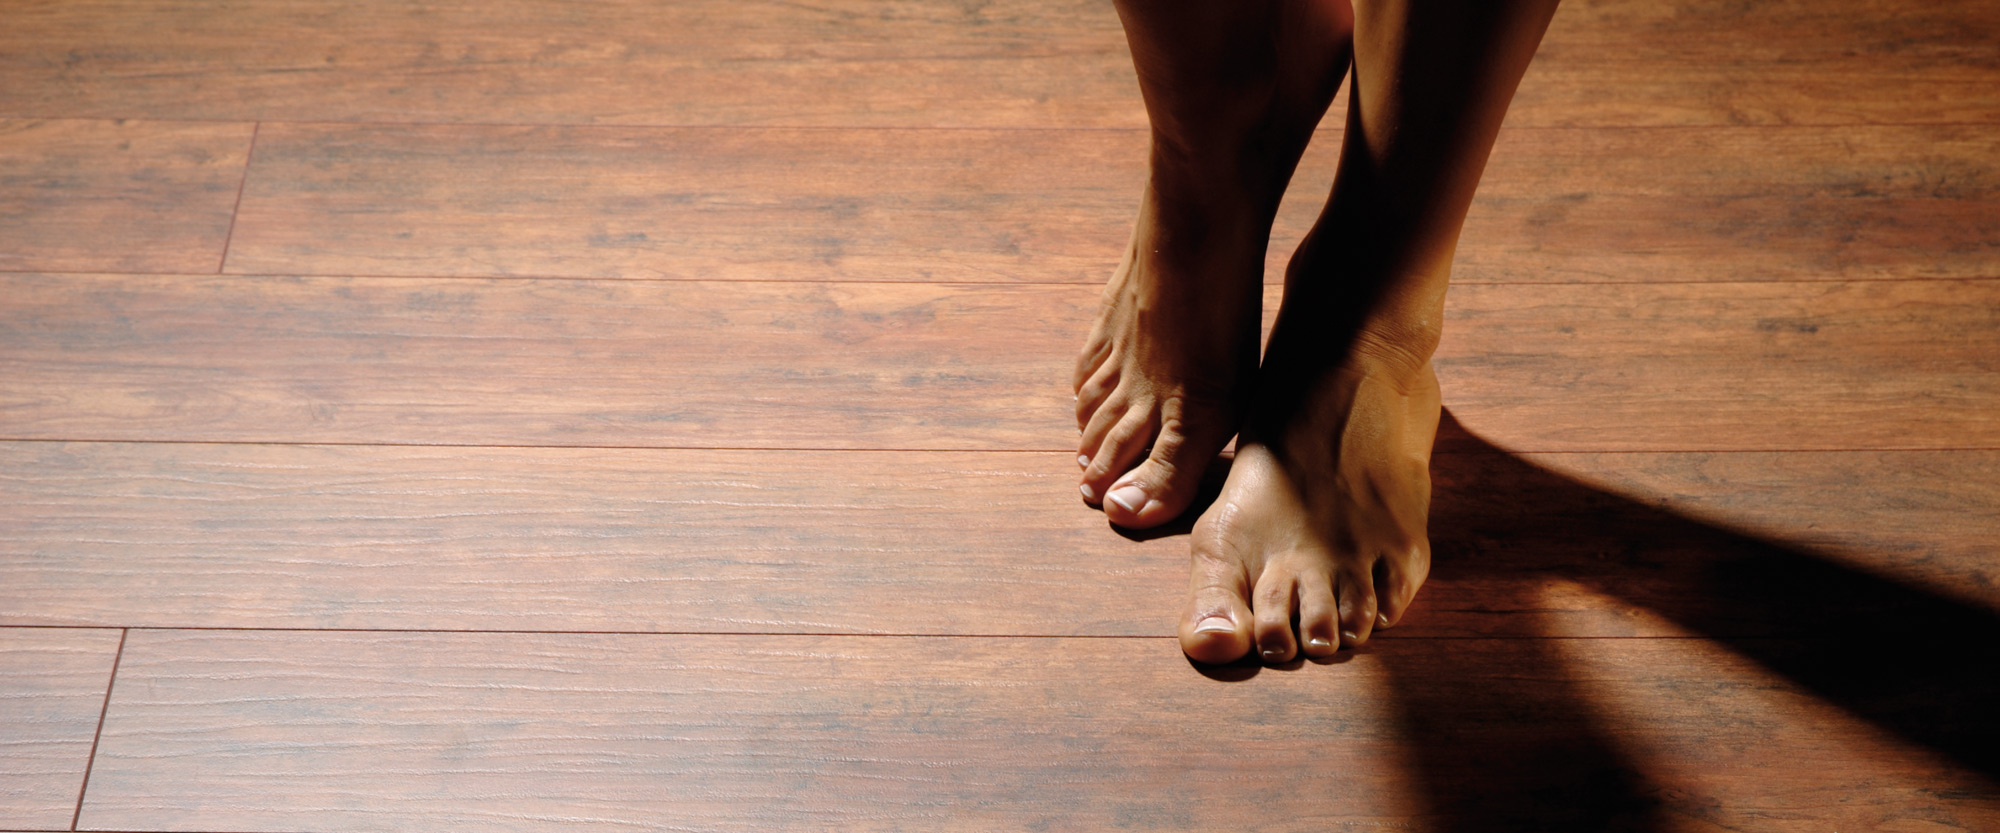 Holzfußboden dunkel Füße Wärme